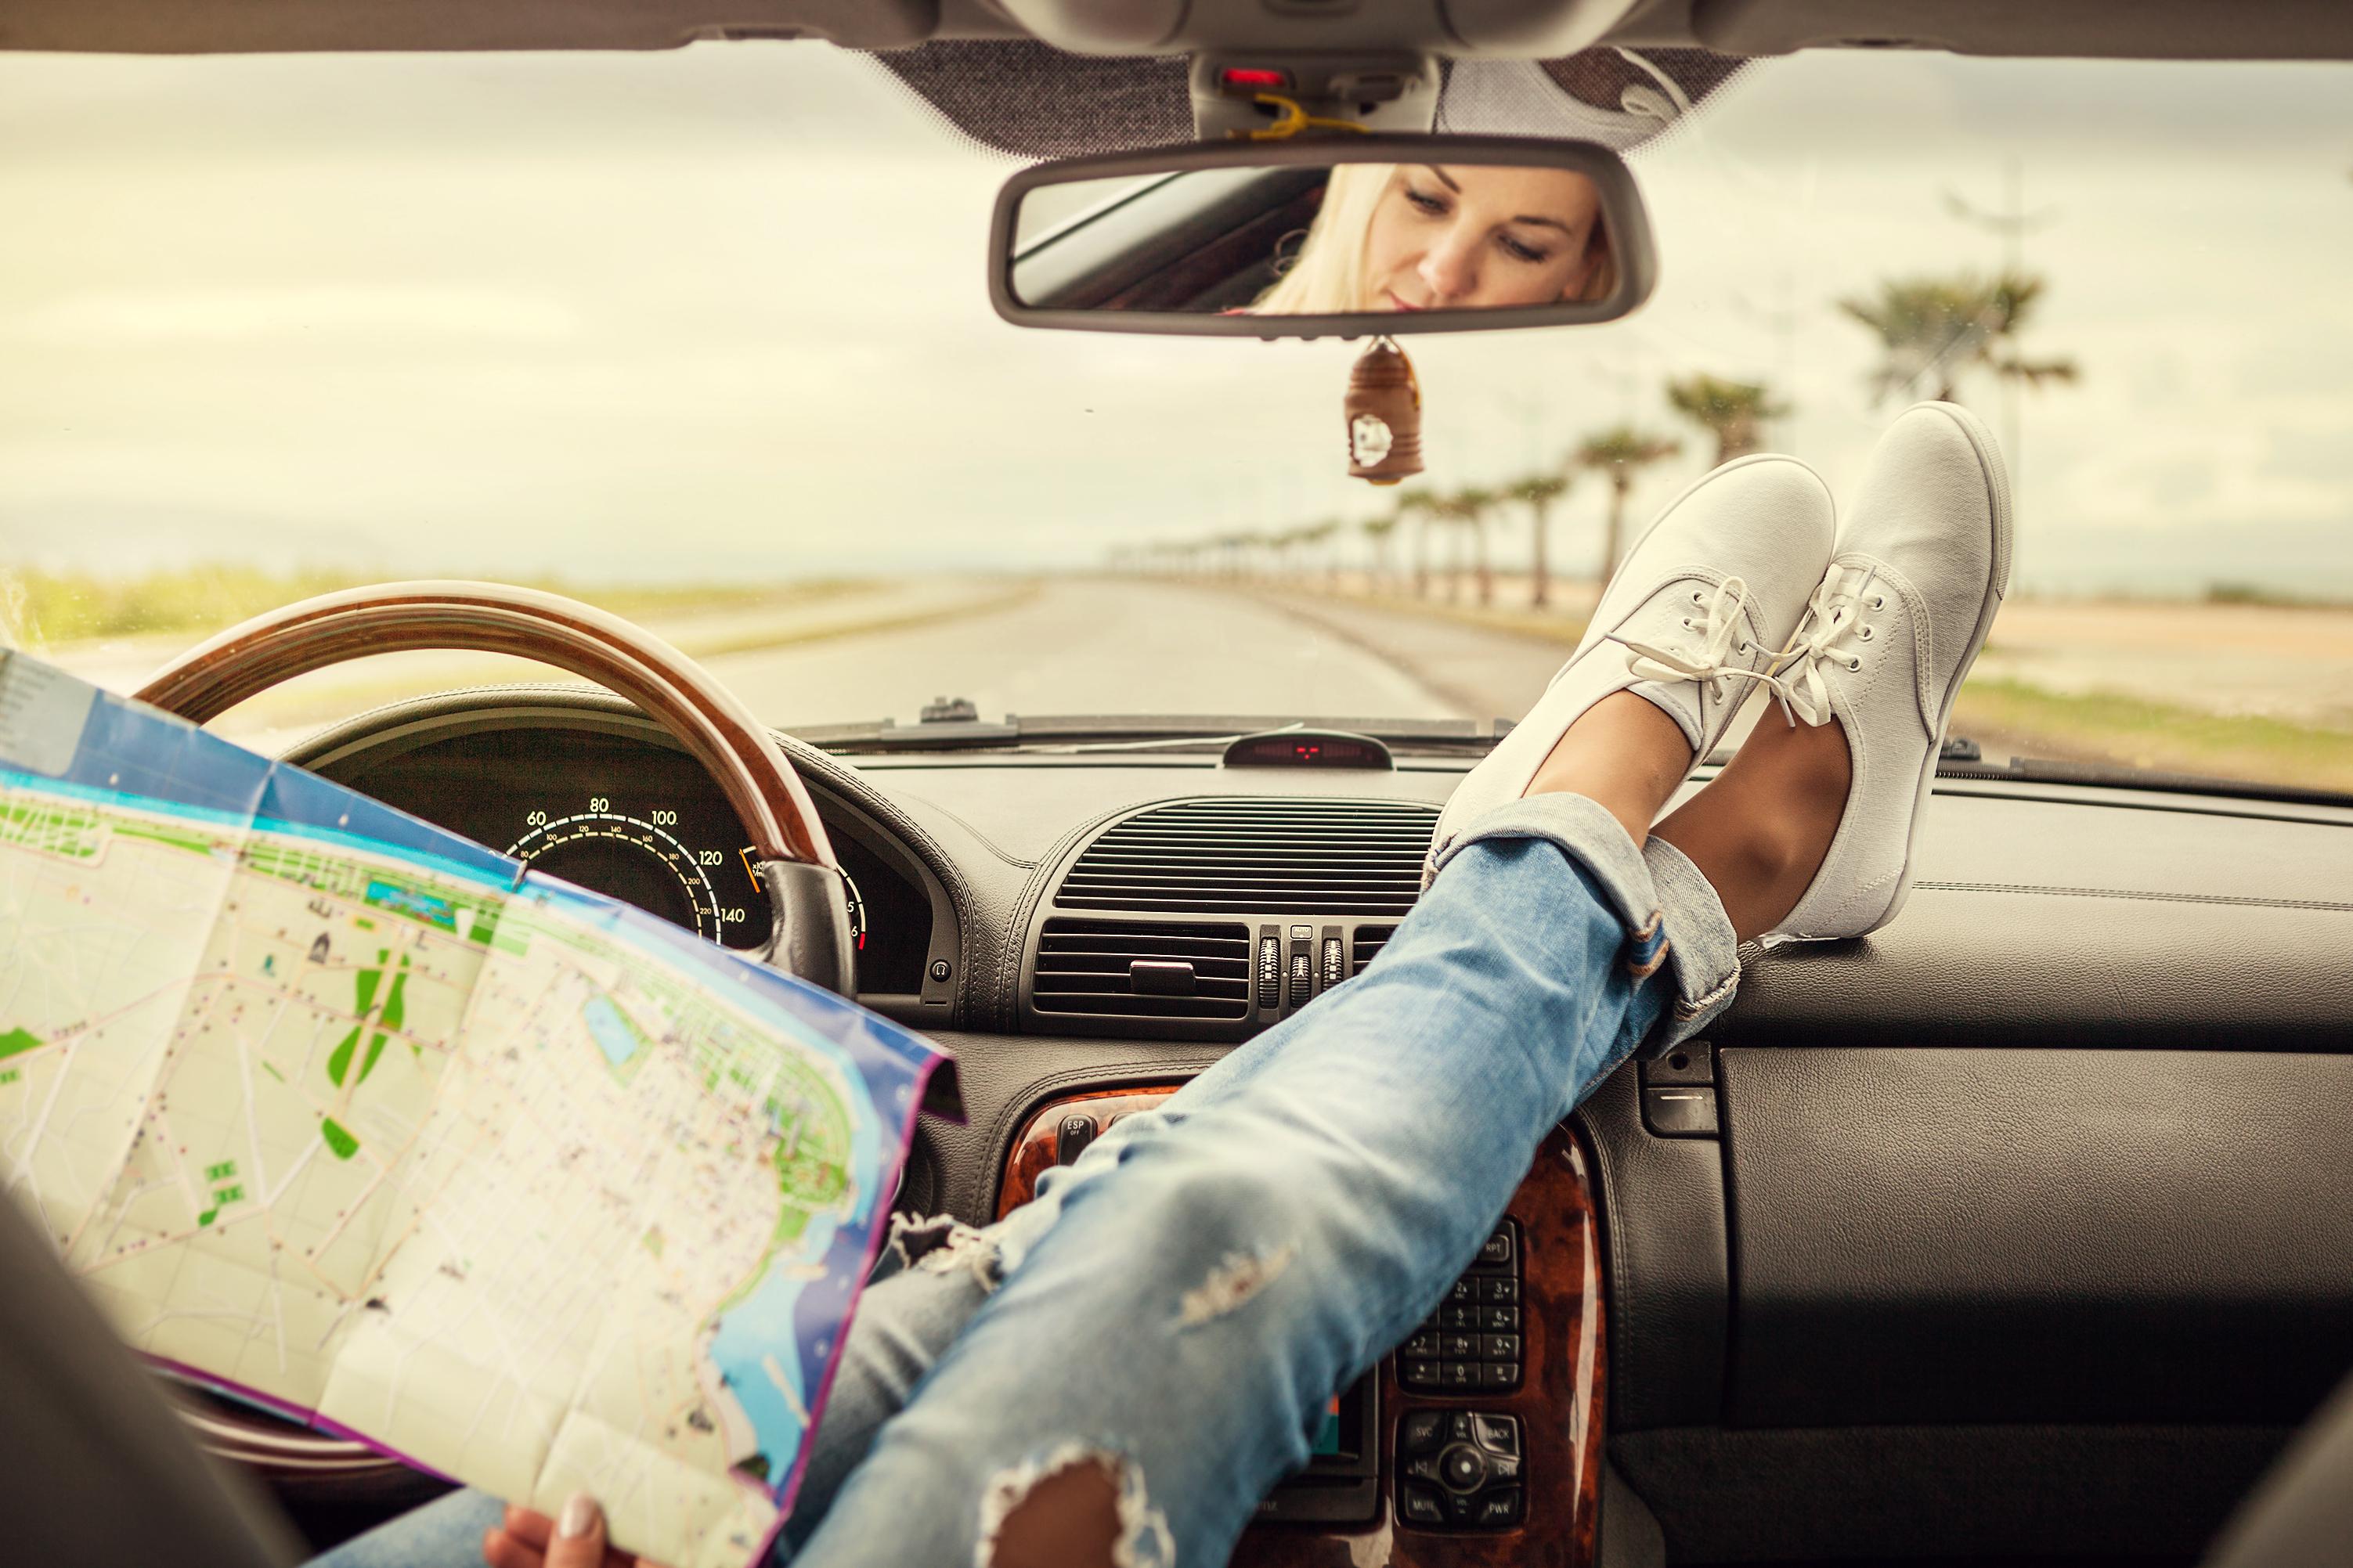 World Life Experience примет на работу путешественников, зарплата - €2500